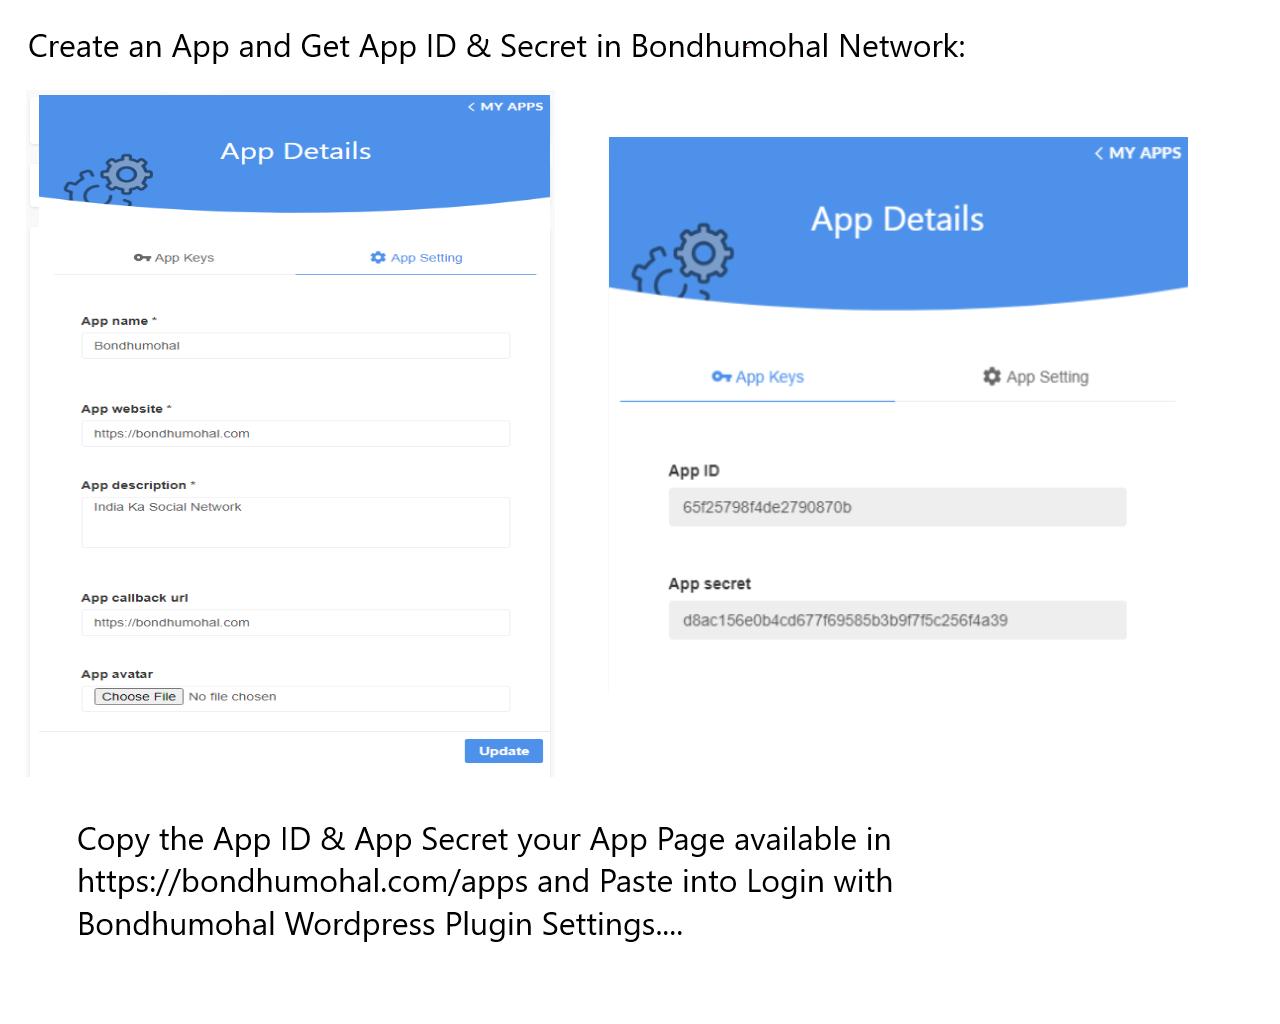 screenshot-1.png How get Bondhumohal App ID & Secret also how to edit app via https://bondhumohal.com/app/*